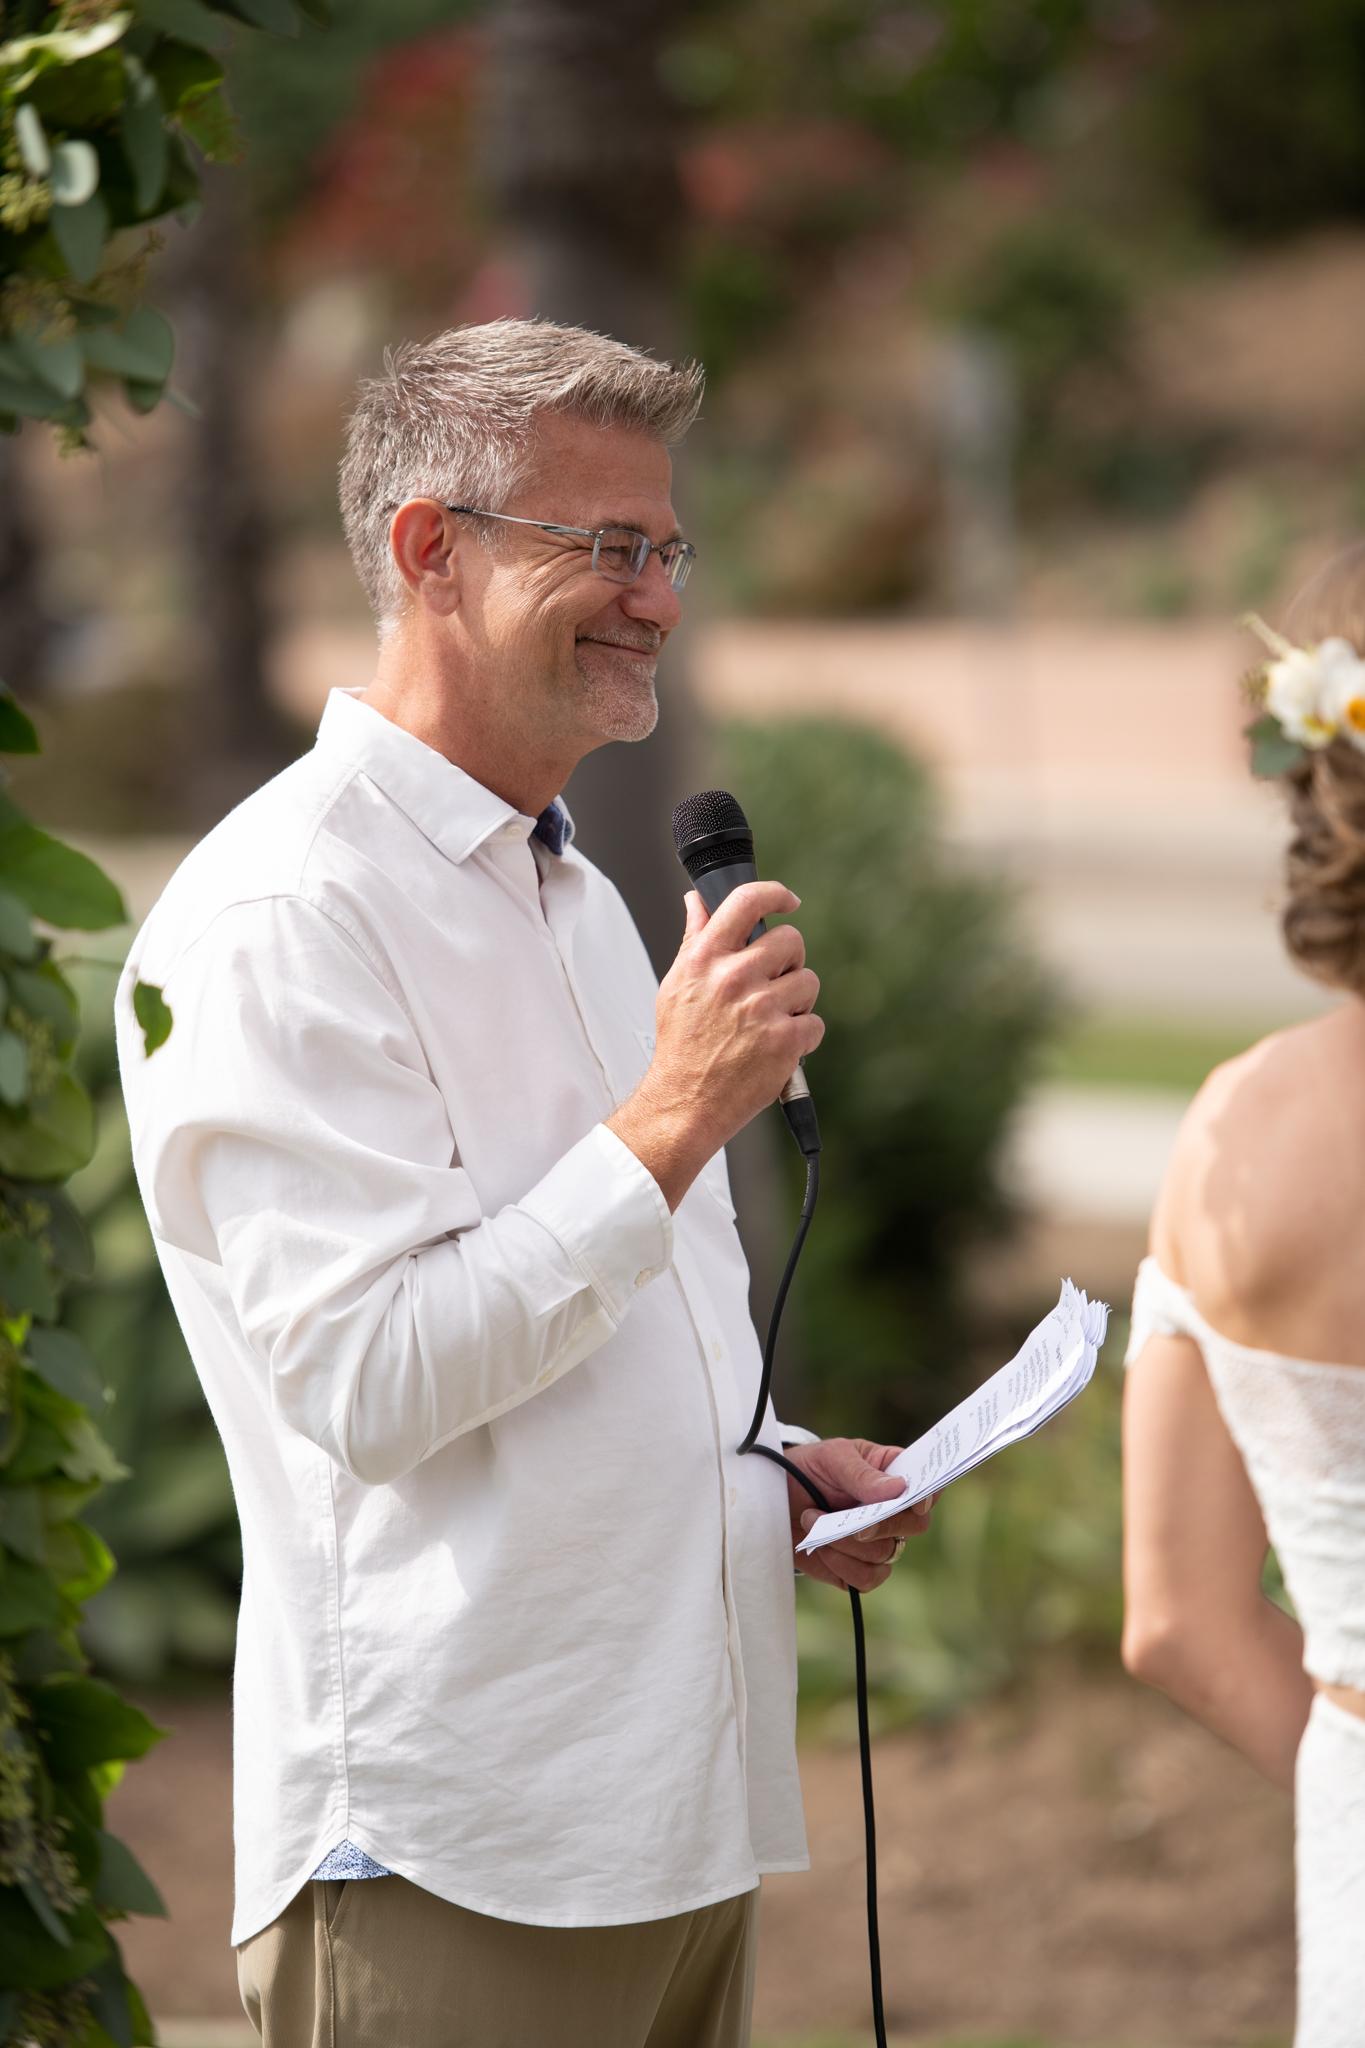 23_PRVW_Jenny_Ken_Wedding_Trevor_Hooper_Photo.jpg